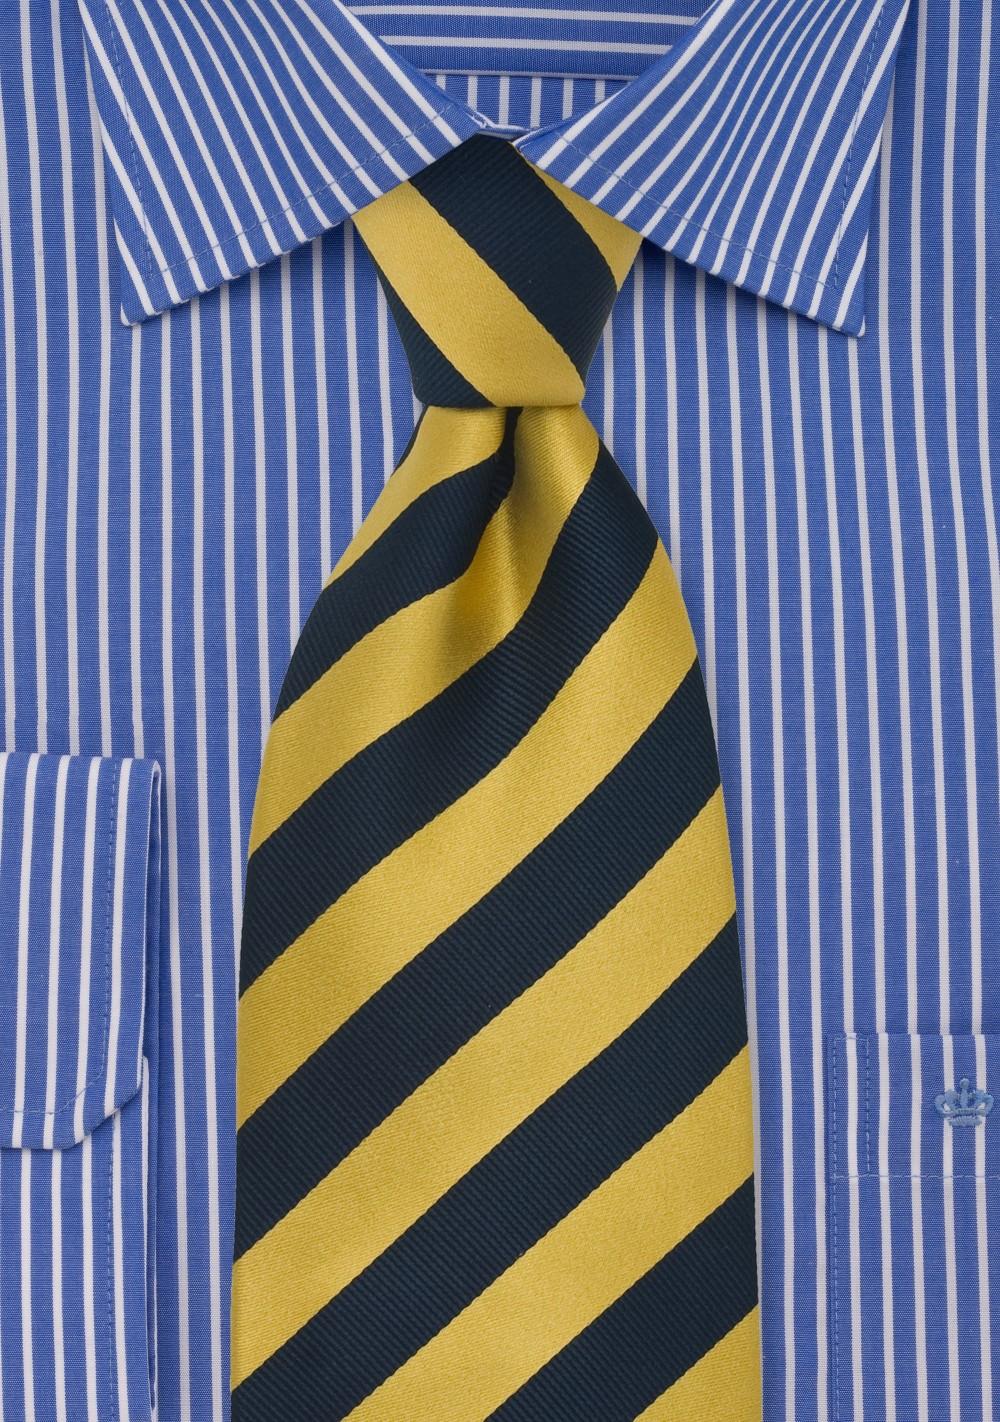 Striped Silk Necktie in Yellow and Navy